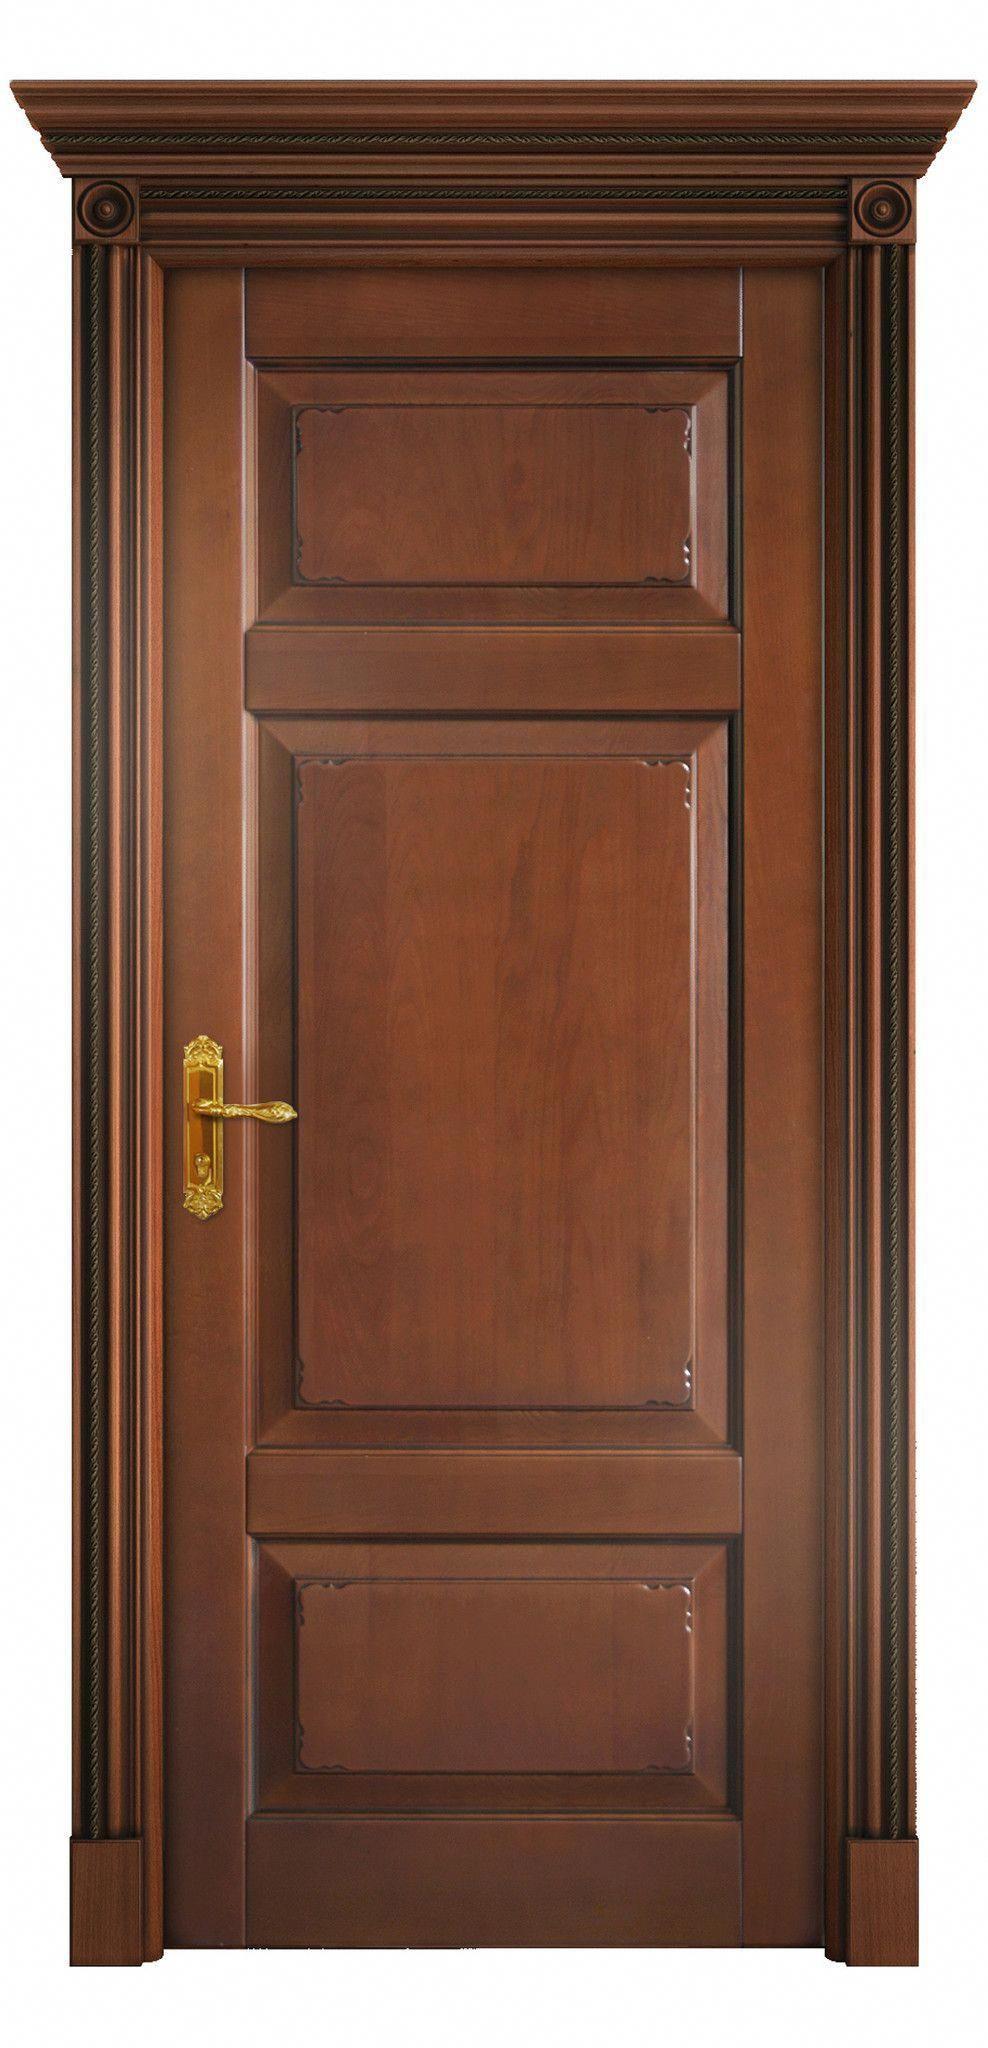 half glass internal doors on contemporary doors half glass internal doors indoor wooden doors with glass 20190524 wood doors interior doors interior interior doors for sale pinterest